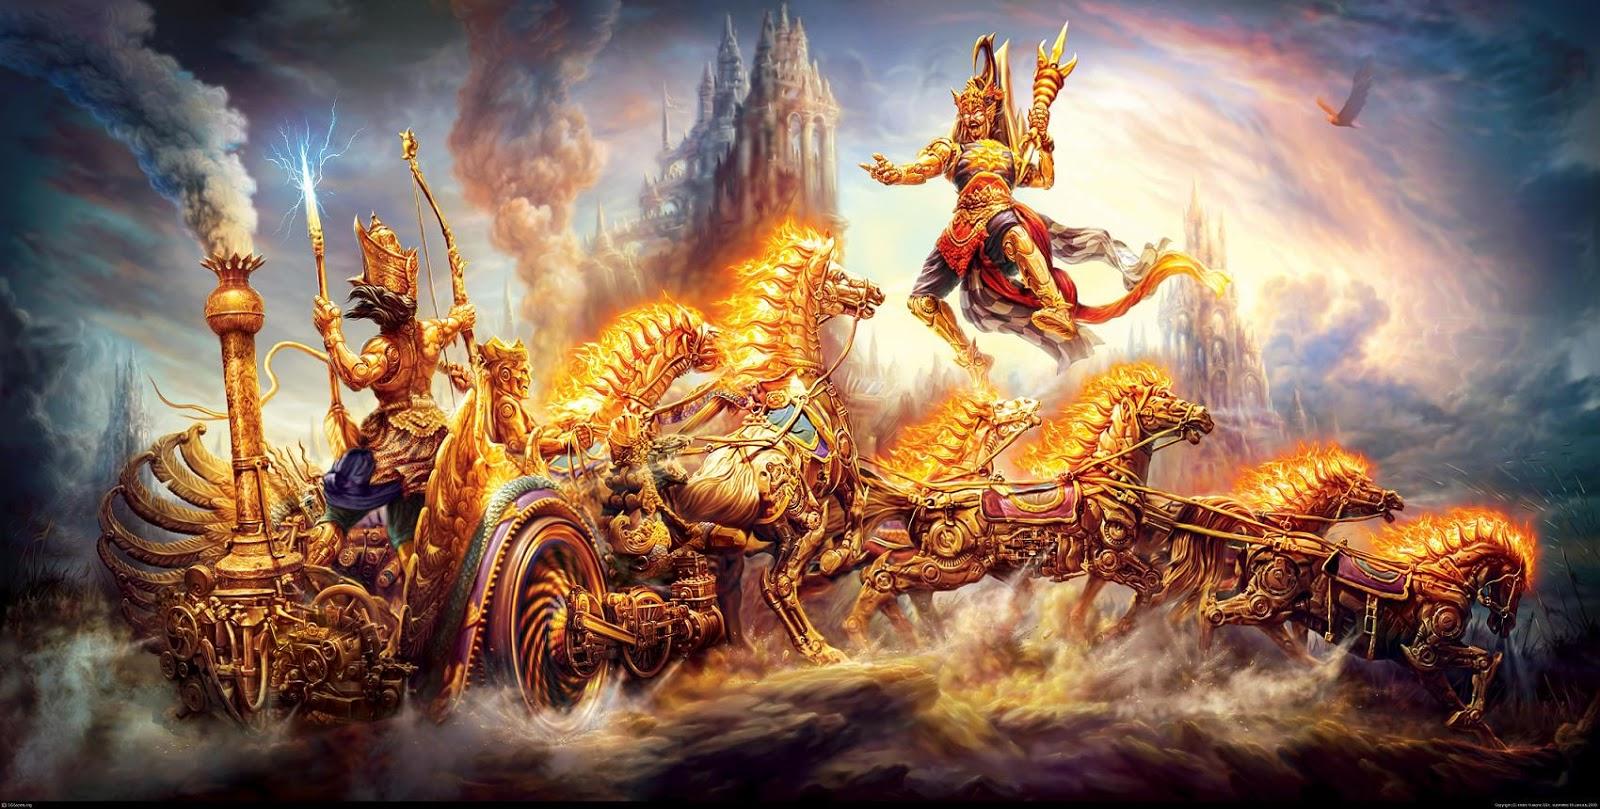 duryodhana, Duryodhana to heaven, Mahabharata, Duryodhana in Mahabharta, Dvapar Yuga, Duryodhana the eldest Kaurava, Draupadi, Pandavas, Kurukshetra, Gandhari, Kauravas, Kaurava and Pandava